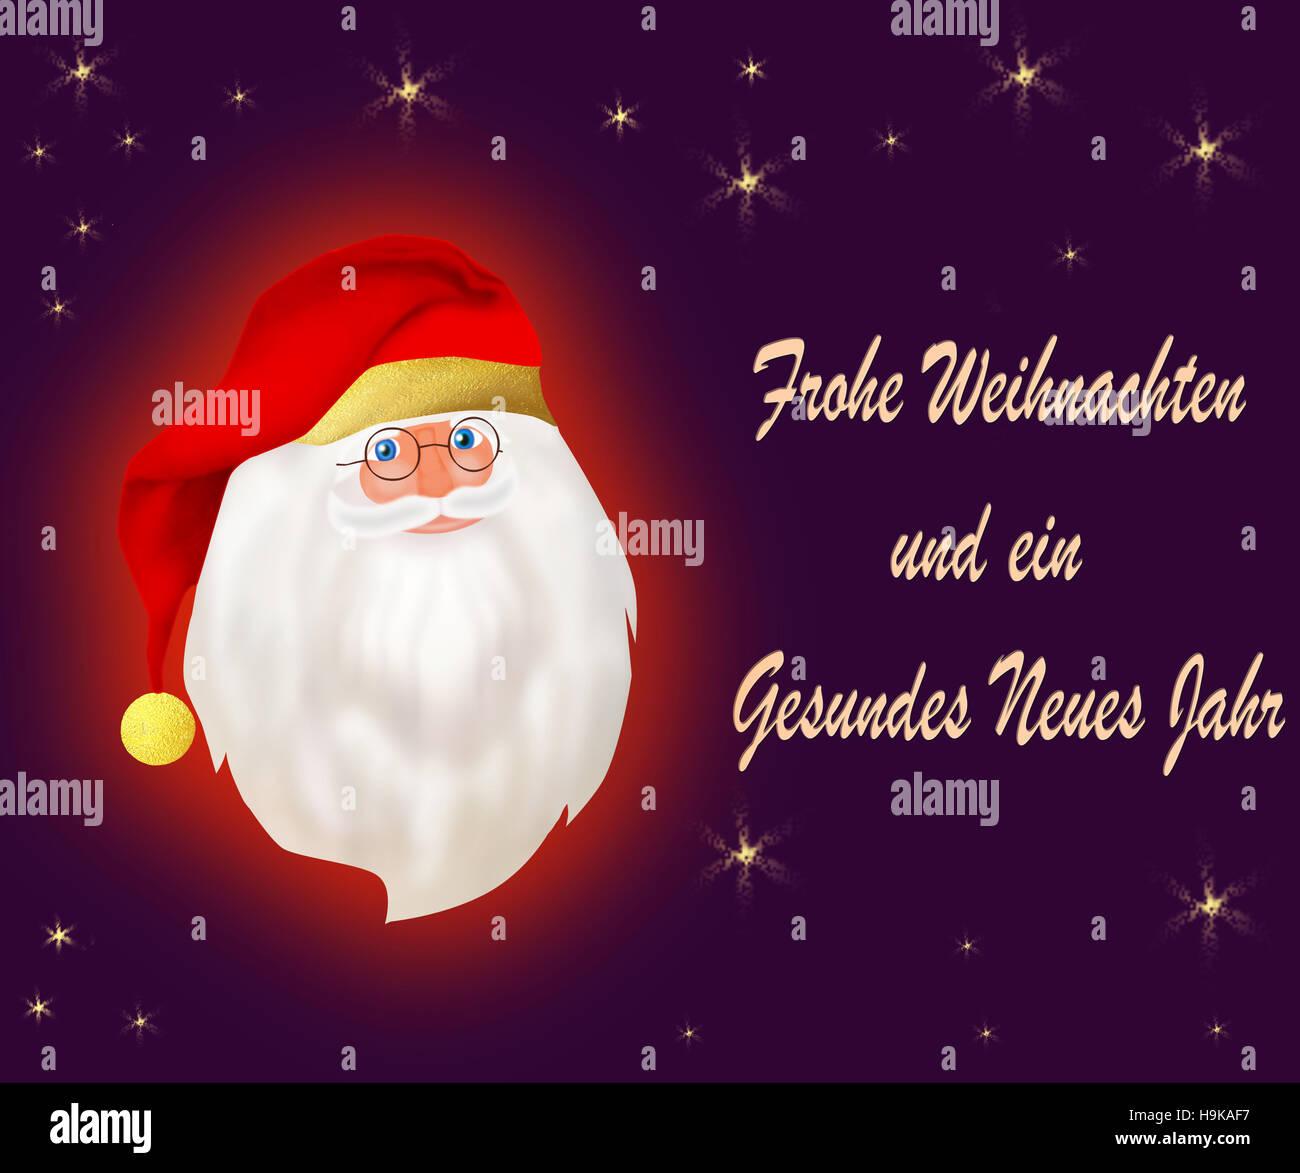 German greeting card for christmas stock photo 126429835 alamy german greeting card for christmas m4hsunfo